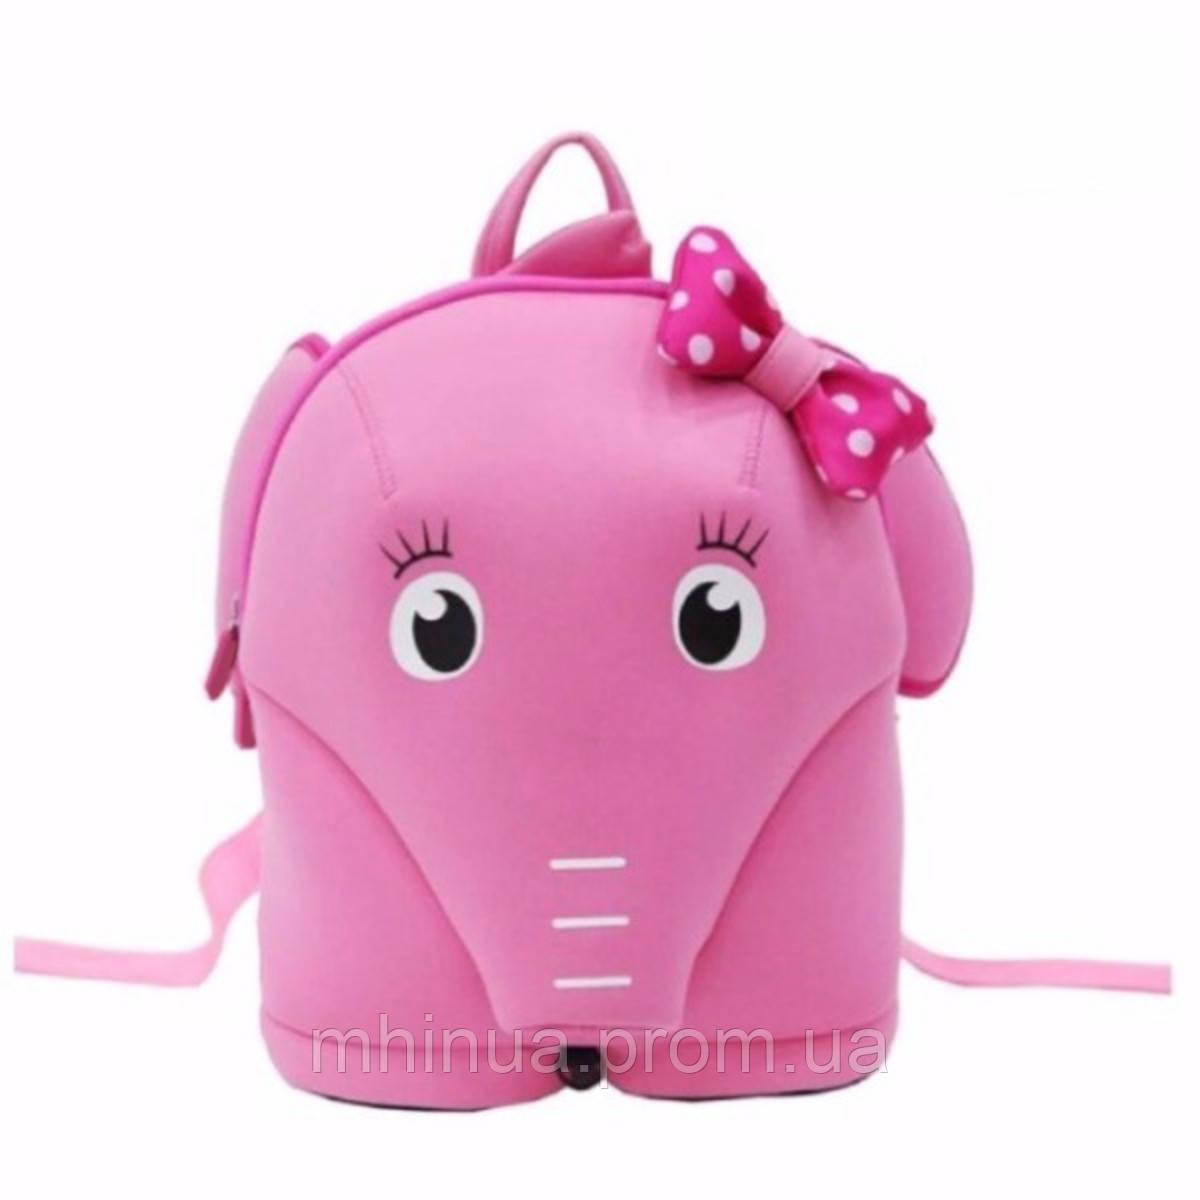 Дитячий рюкзак Nohoo Слоник Рожевий (NH071)